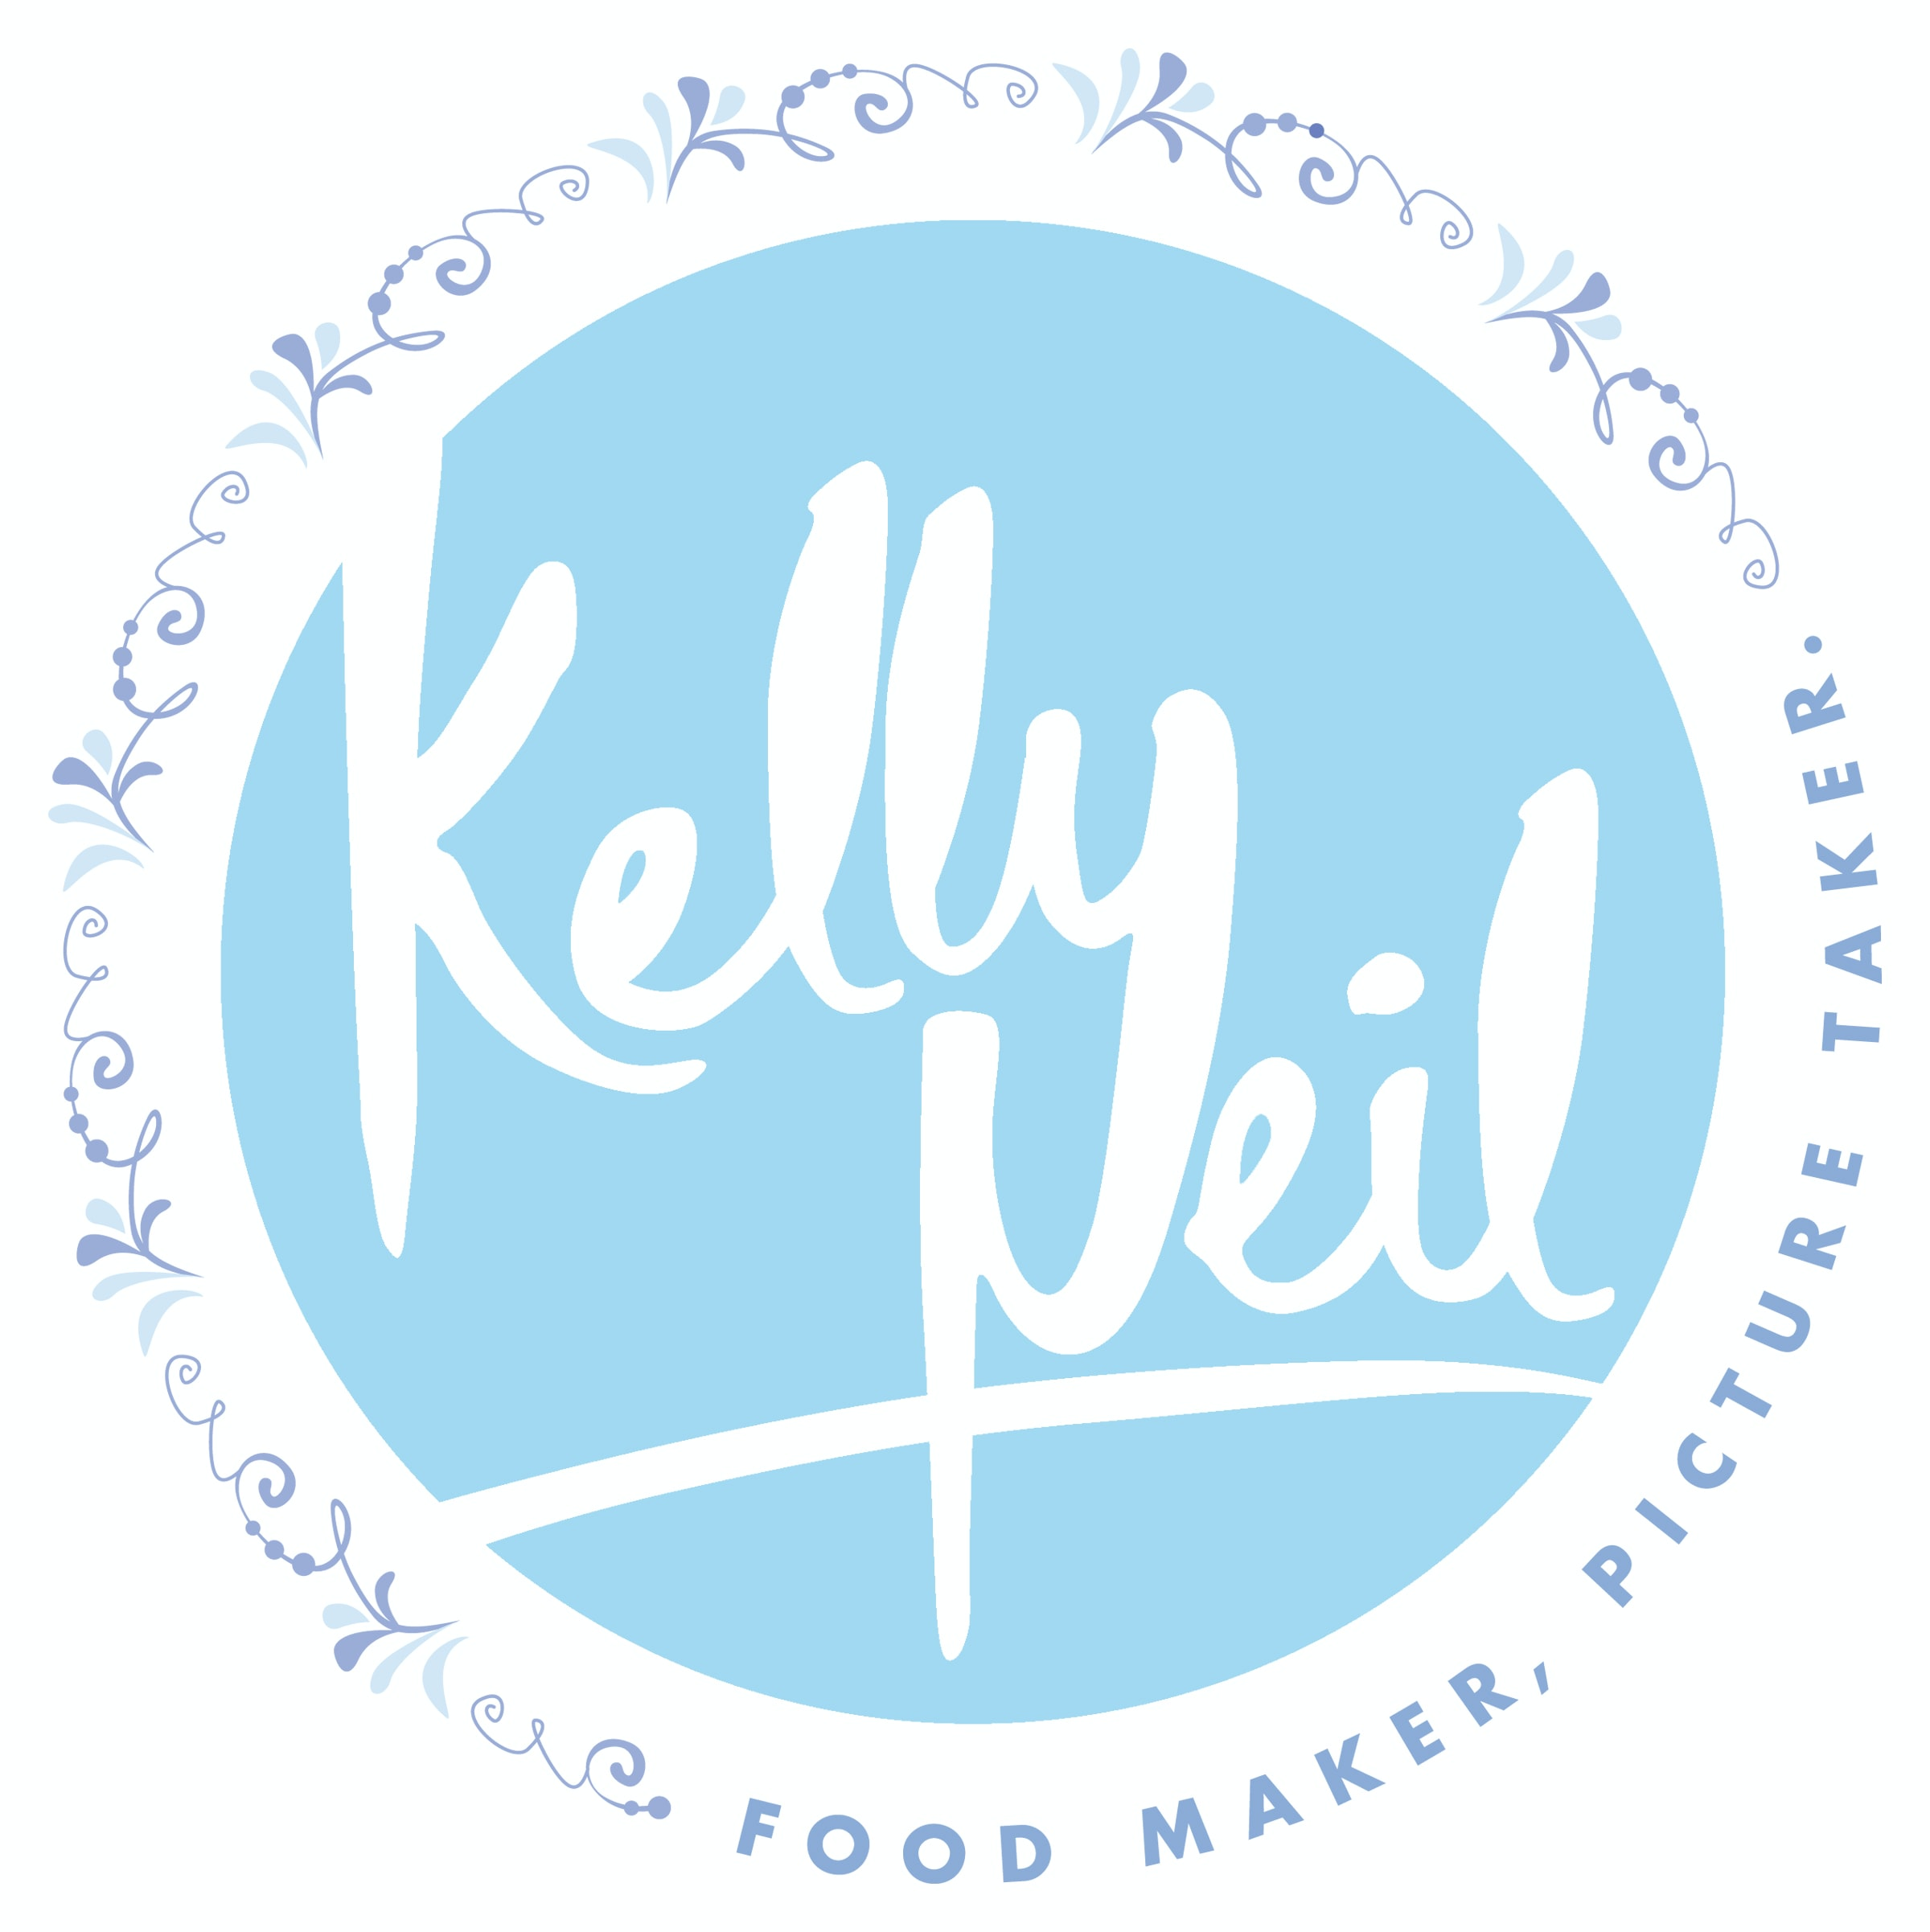 Go to Kelly Neil's profile